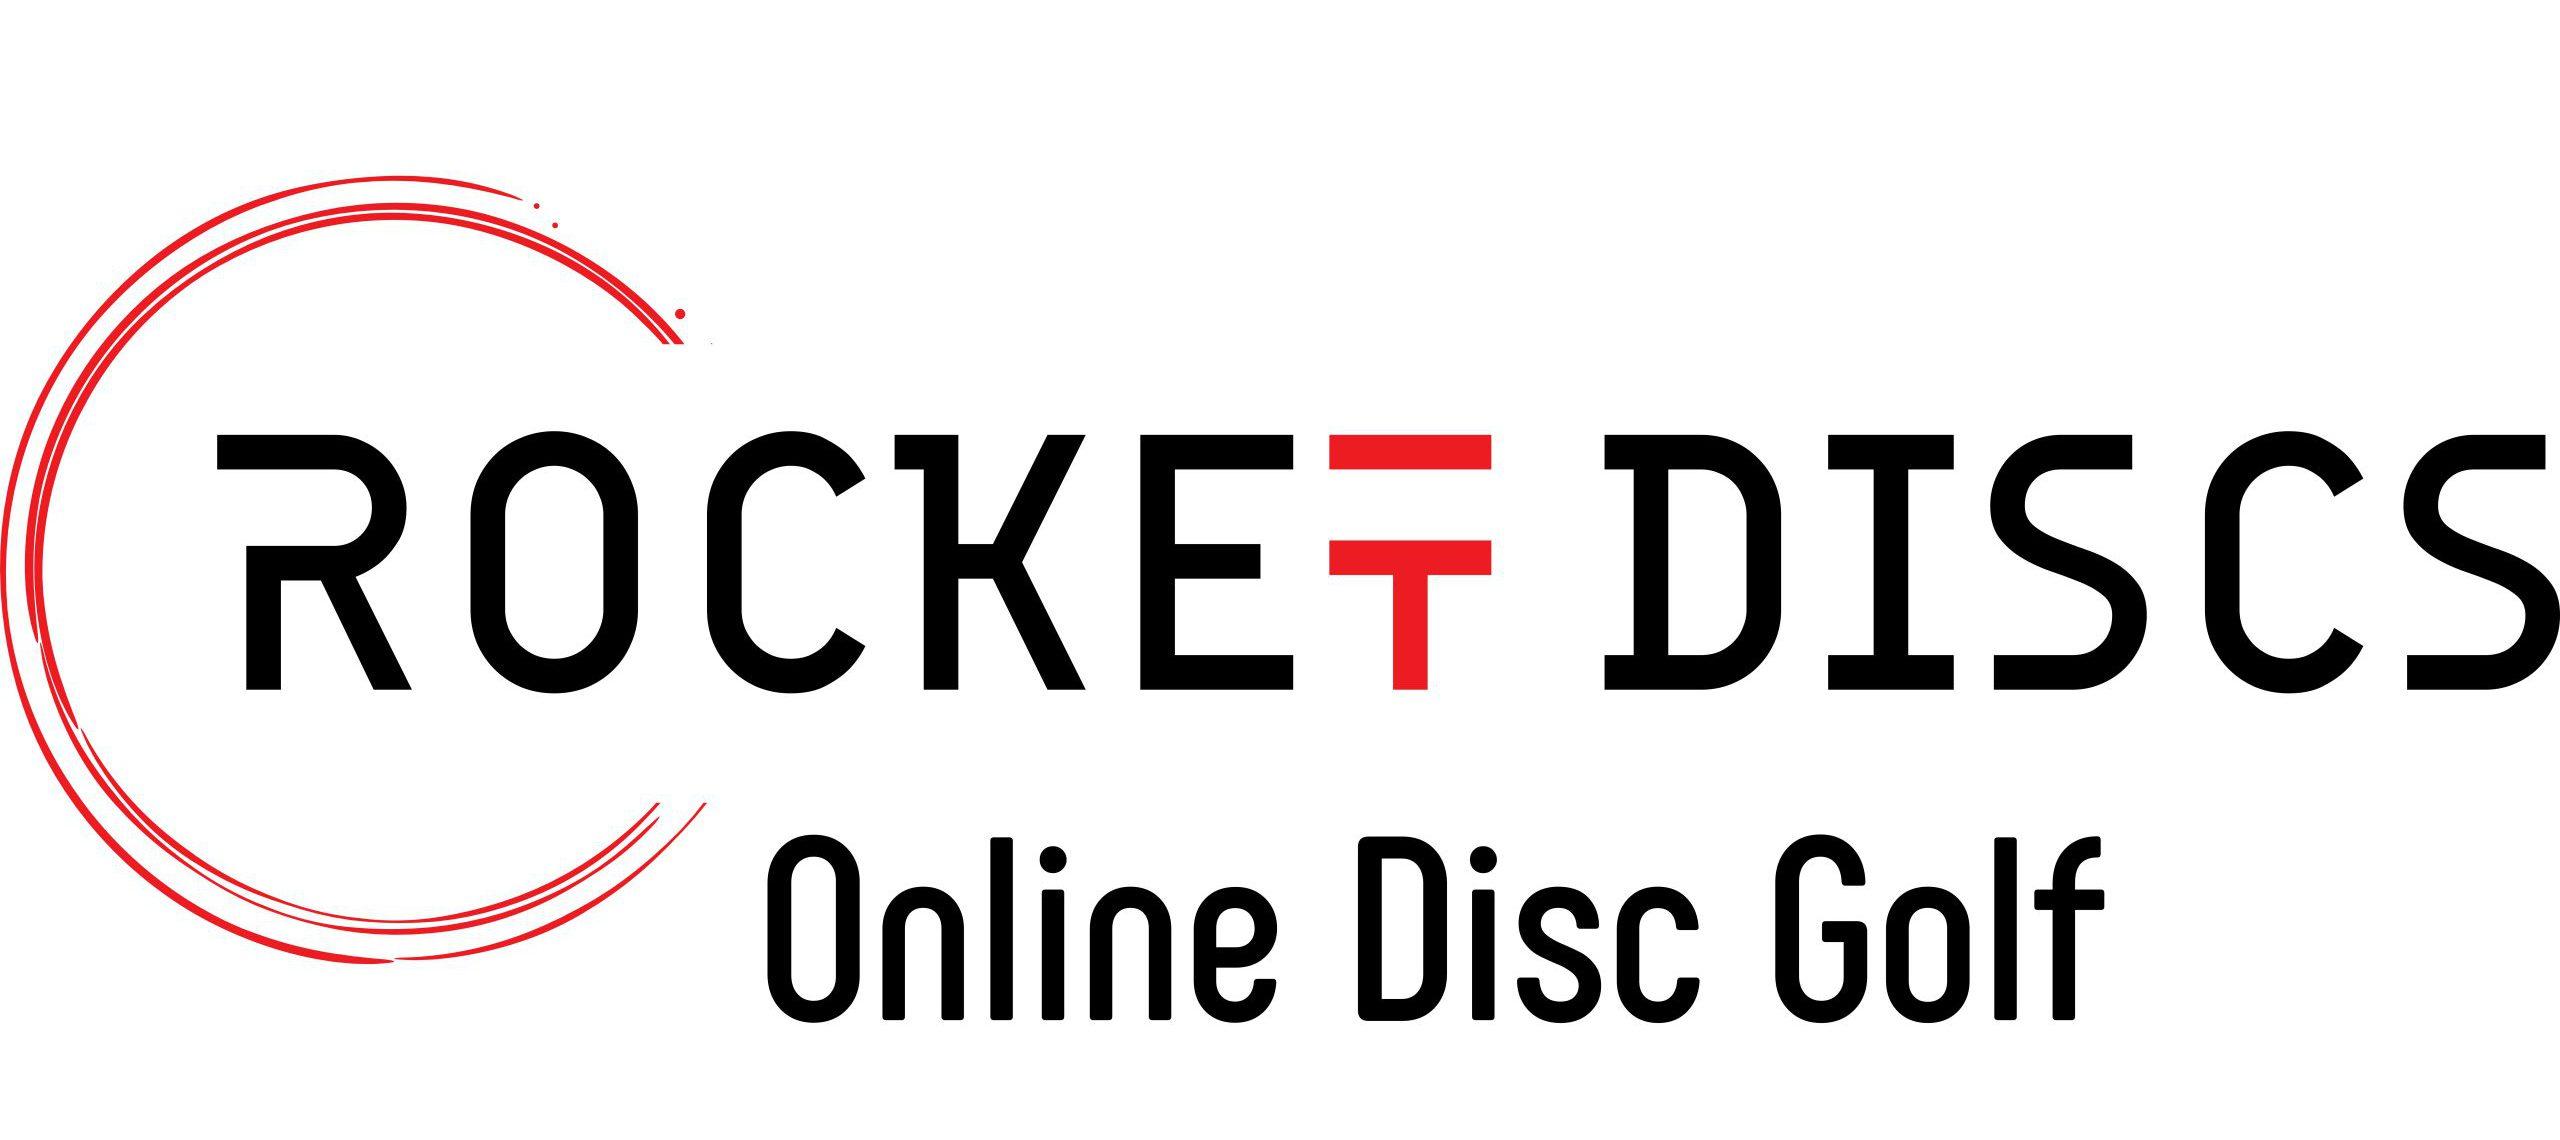 Rocket Discs Blog